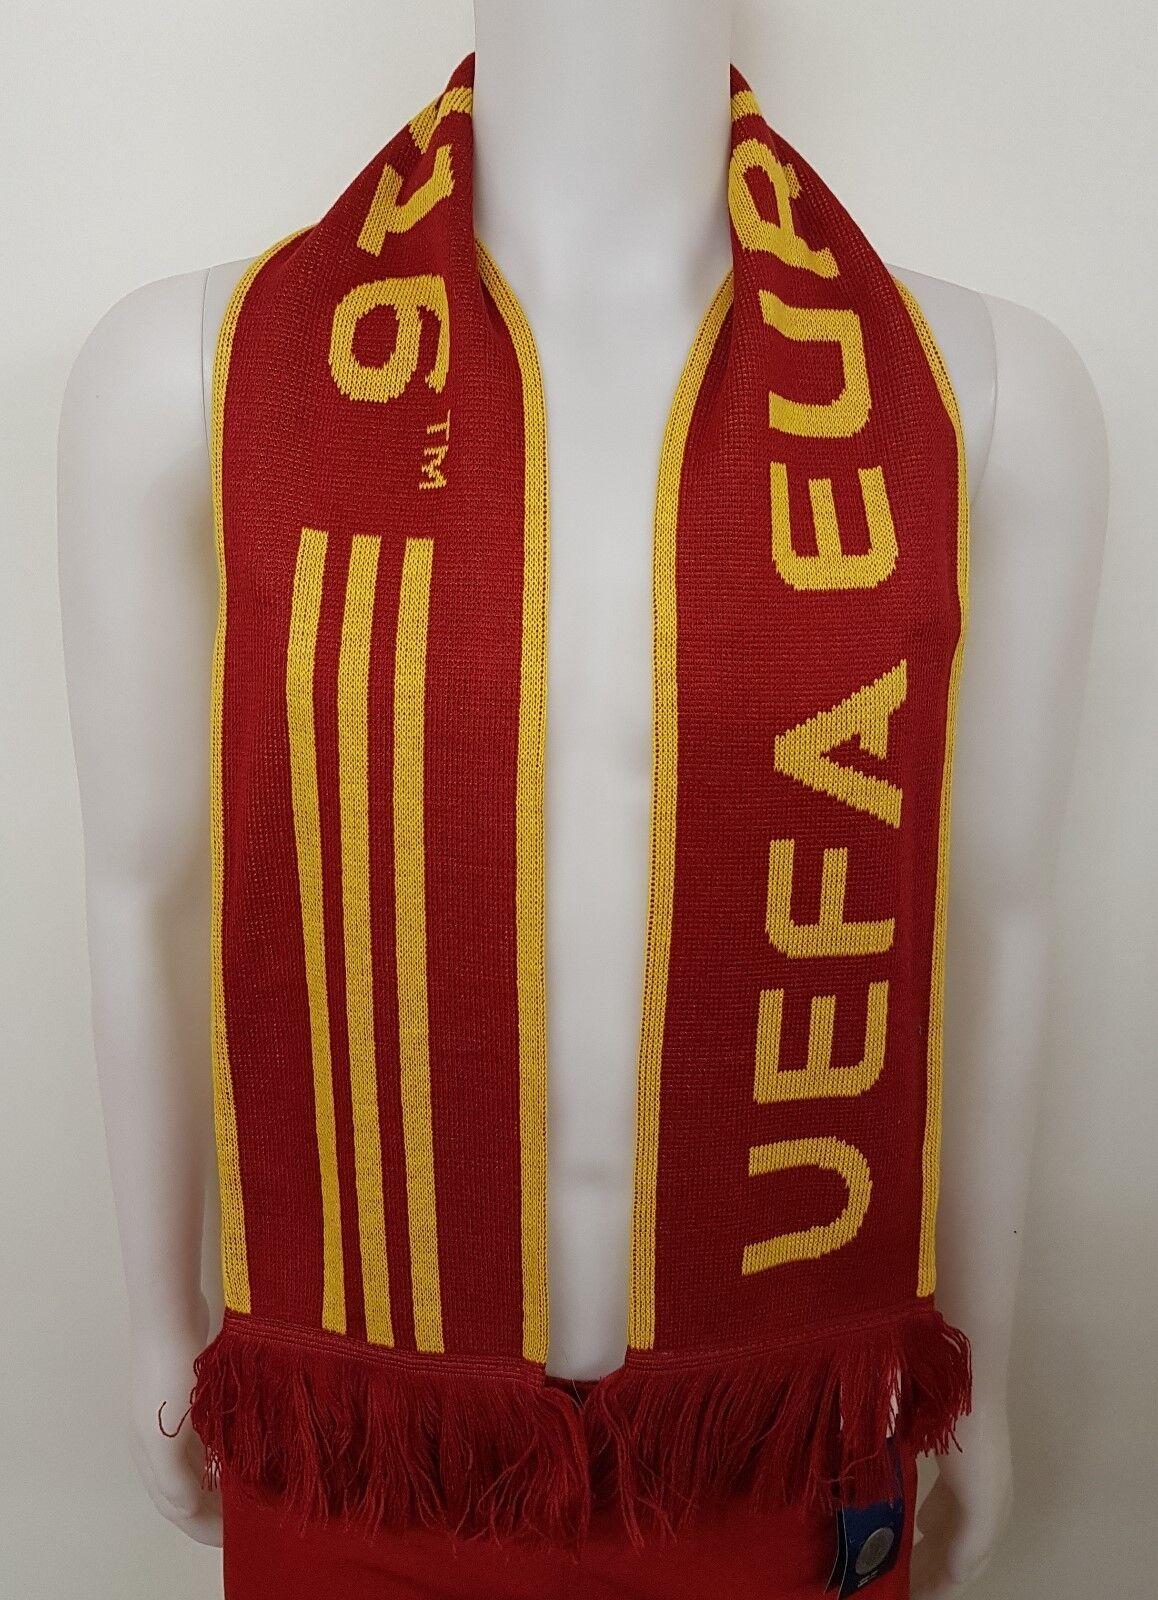 Adidas Spanien Spanien Spanien Schal Fanschal FEF Scarf Heim Fanartikel Espana Spain EM WM  | Neuankömmling  7b2de3